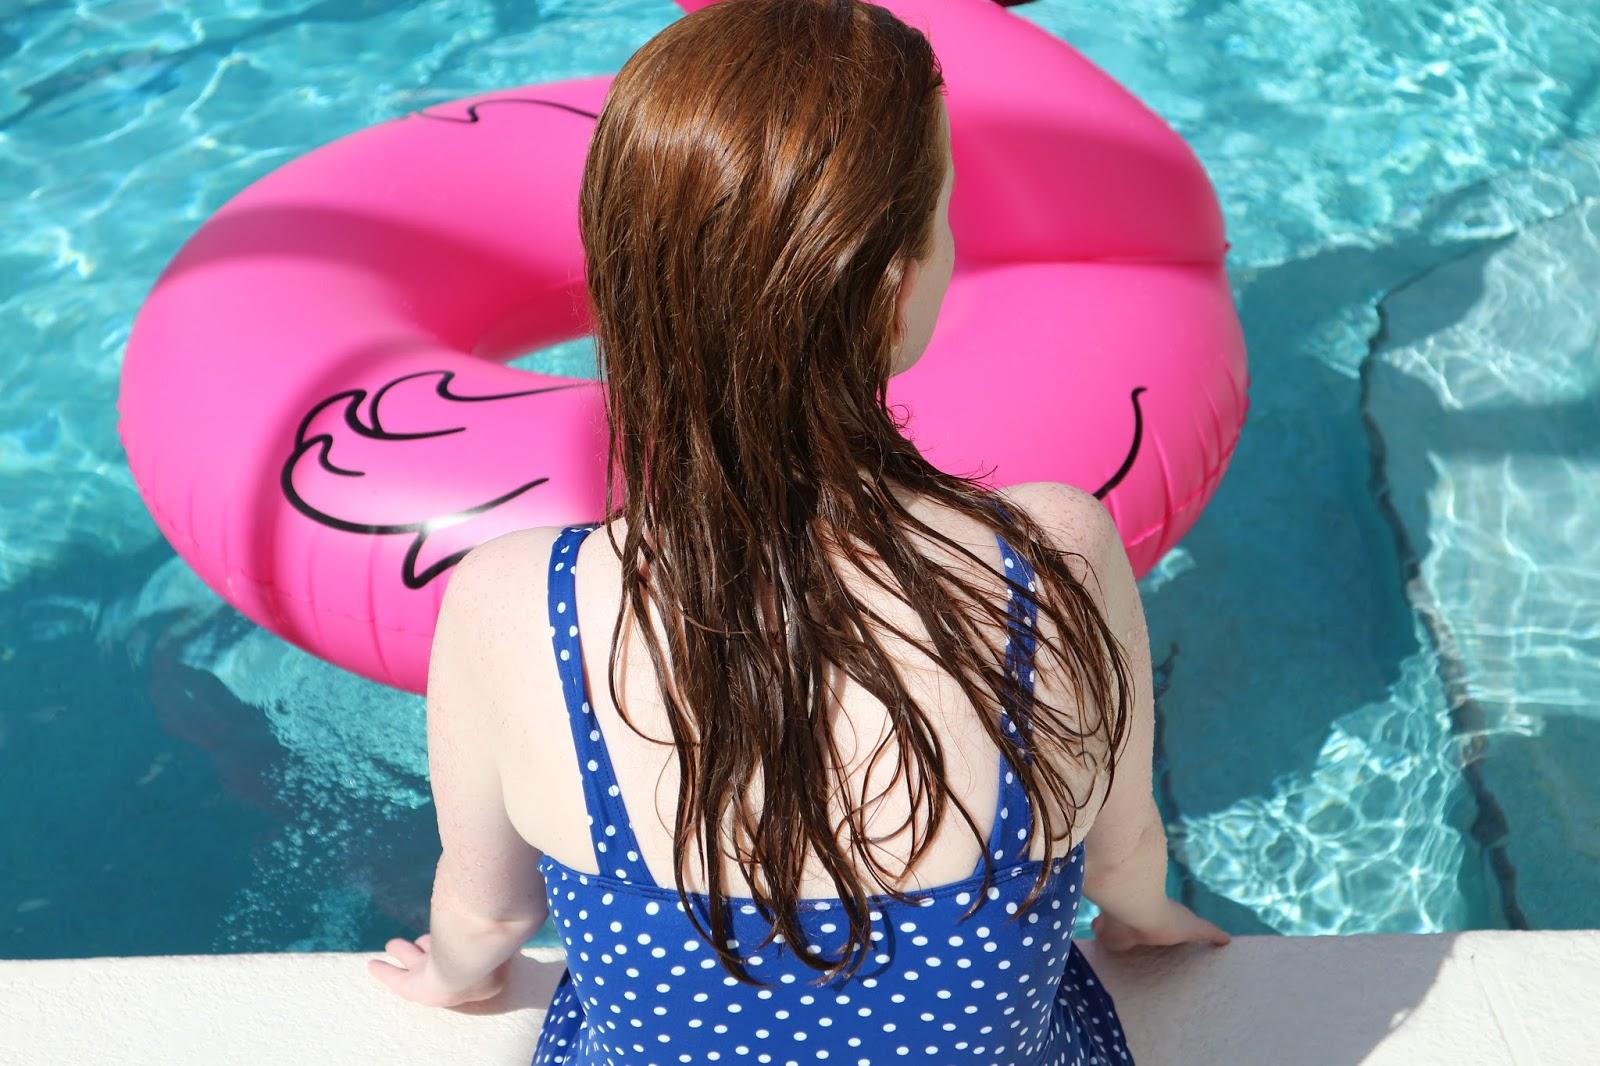 Swimwear body confidence tips